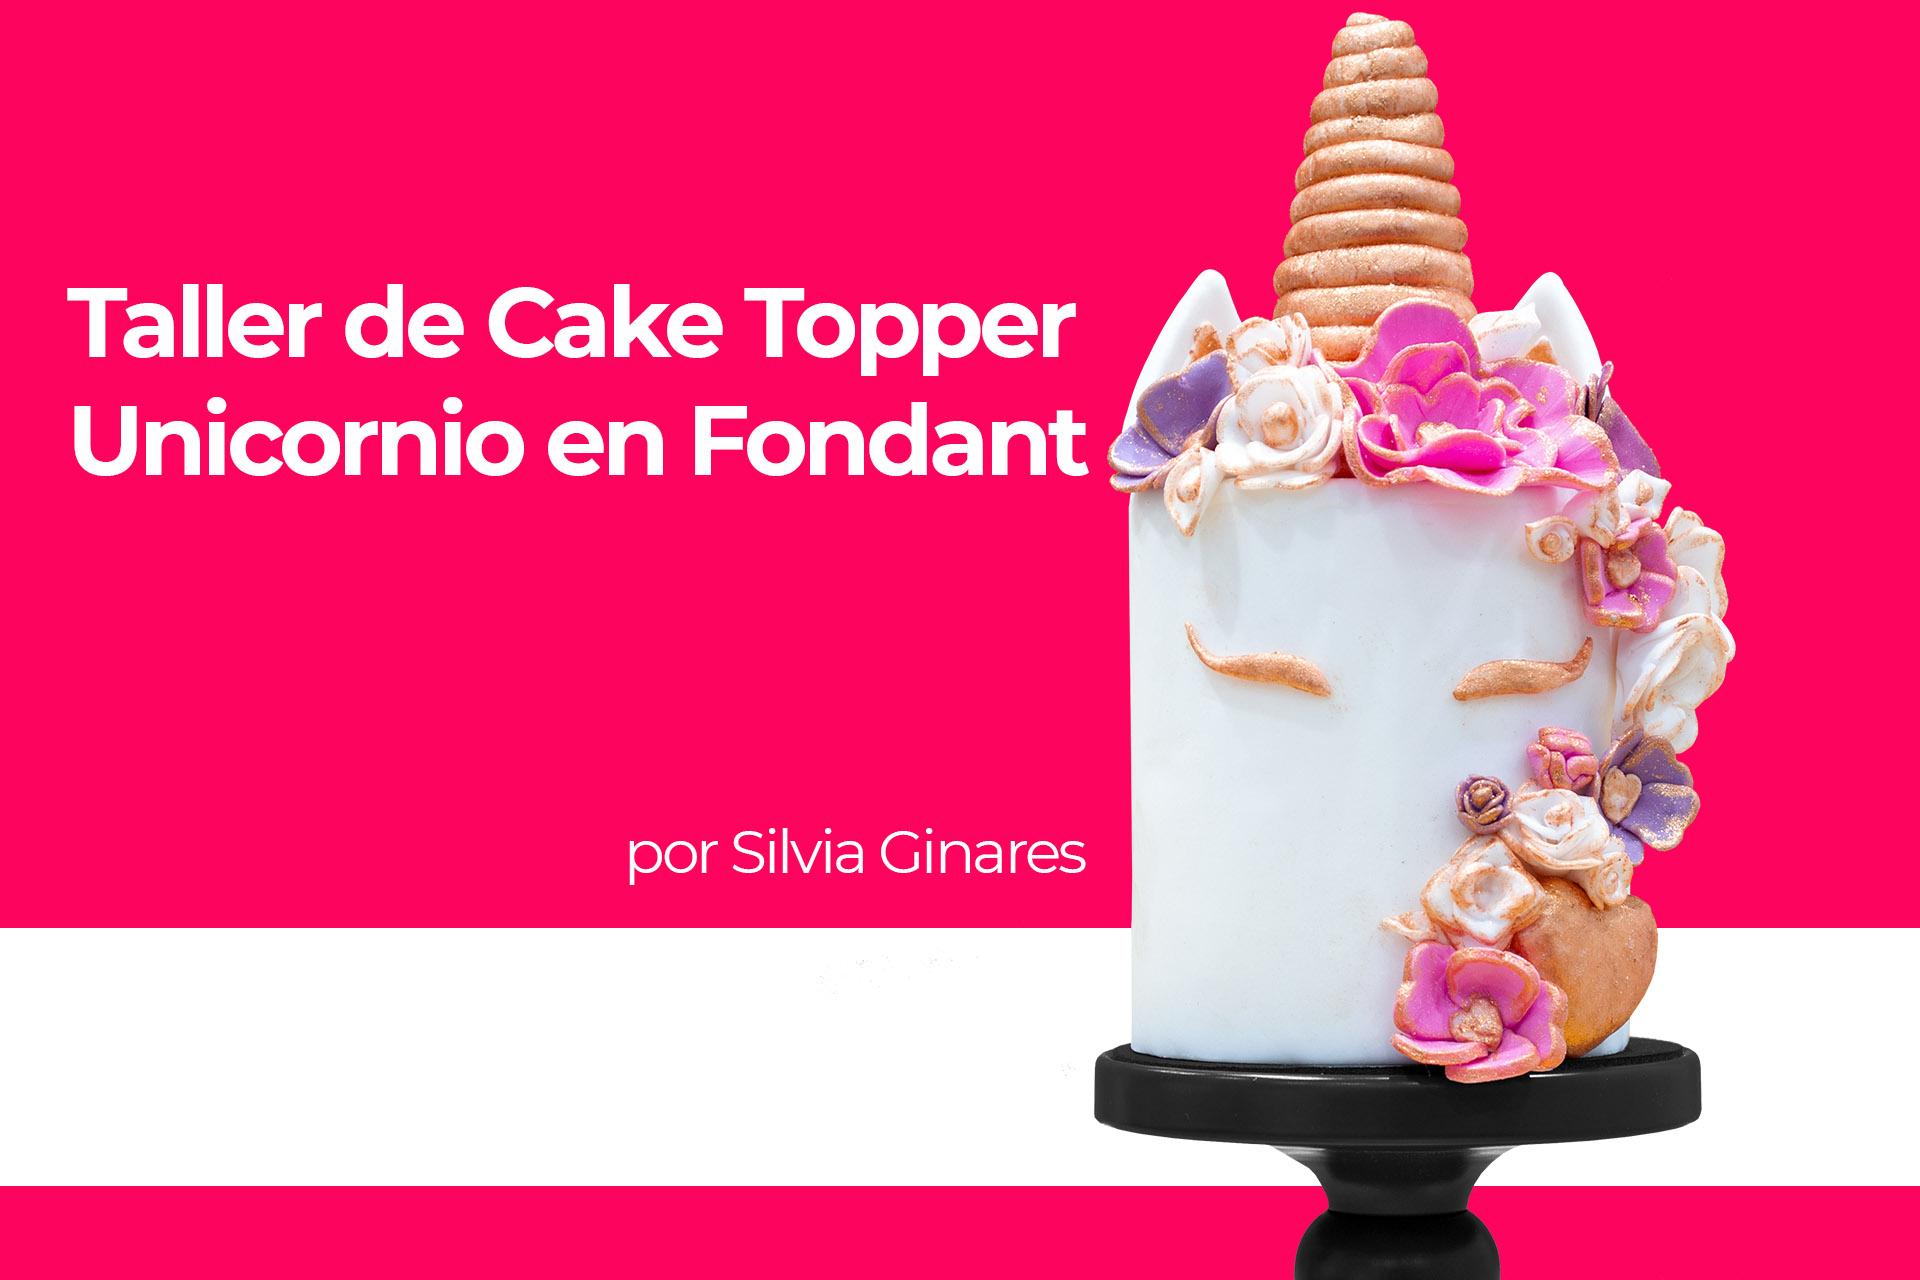 Taller de Cake Topper en Fondant - Unicornio